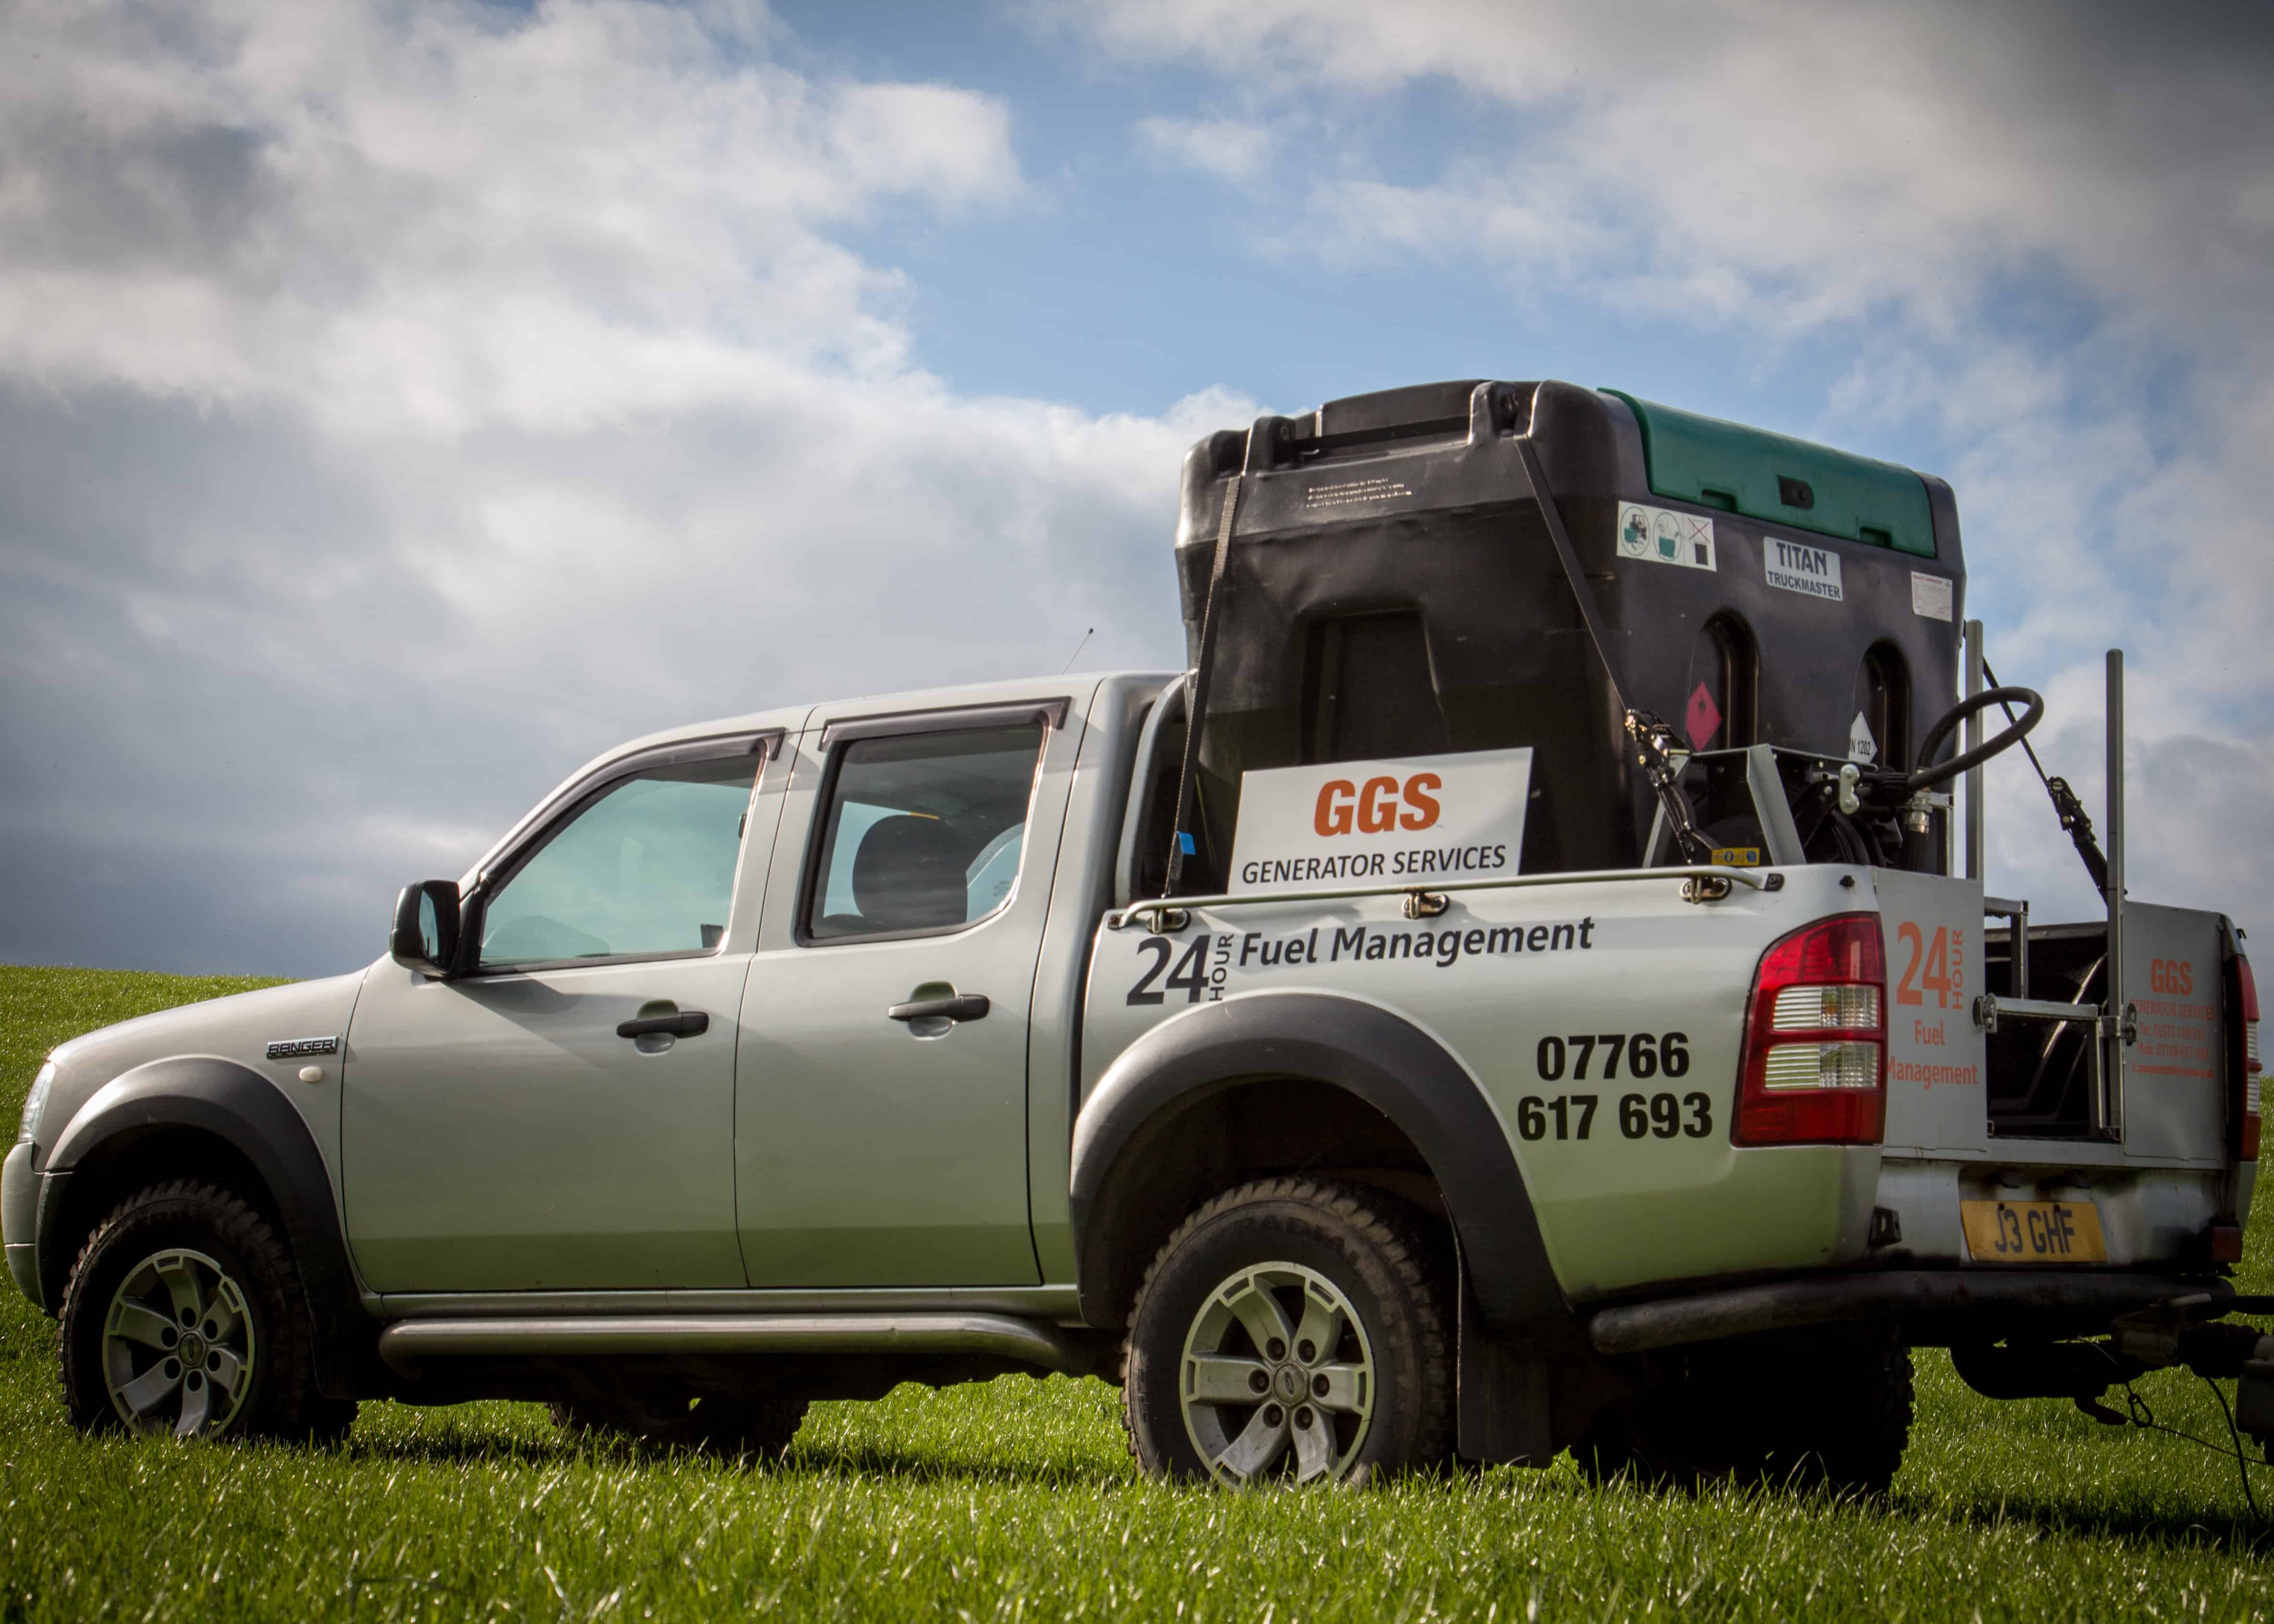 Generator hire Scotland van pulling a trailer